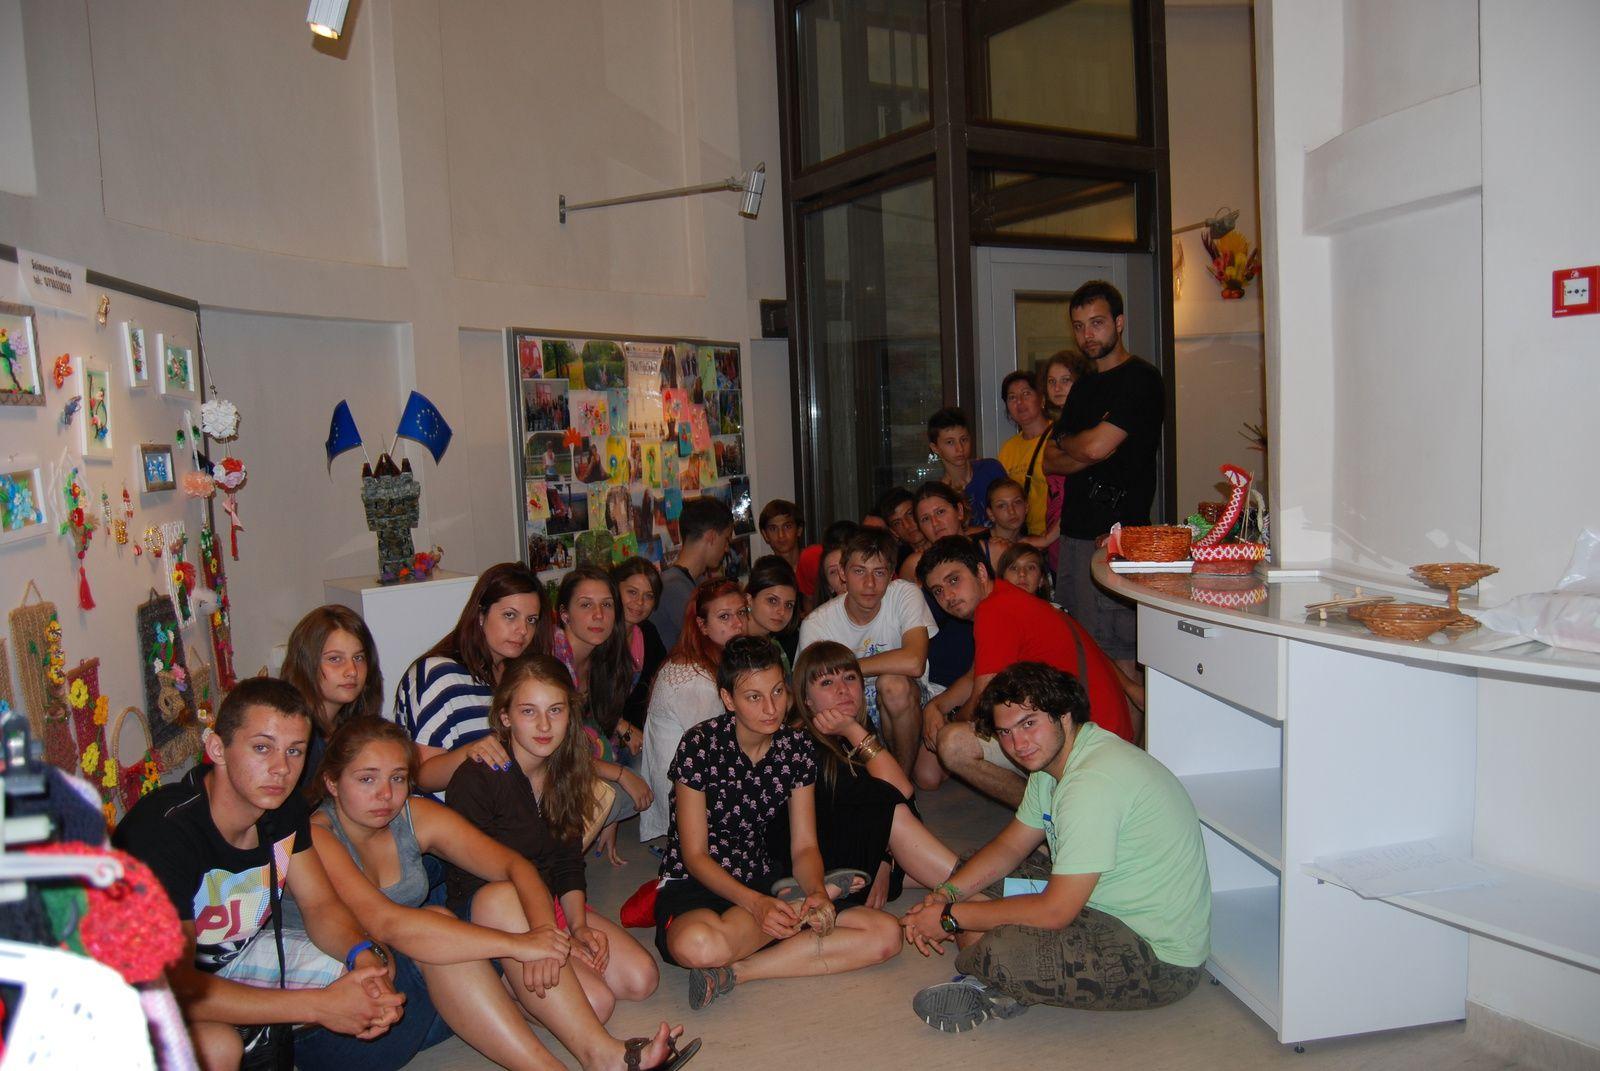 Eyouthocracy Youth Exchange-9th Day-Monday 16th july 2013-Drobeta Turnu Severin city